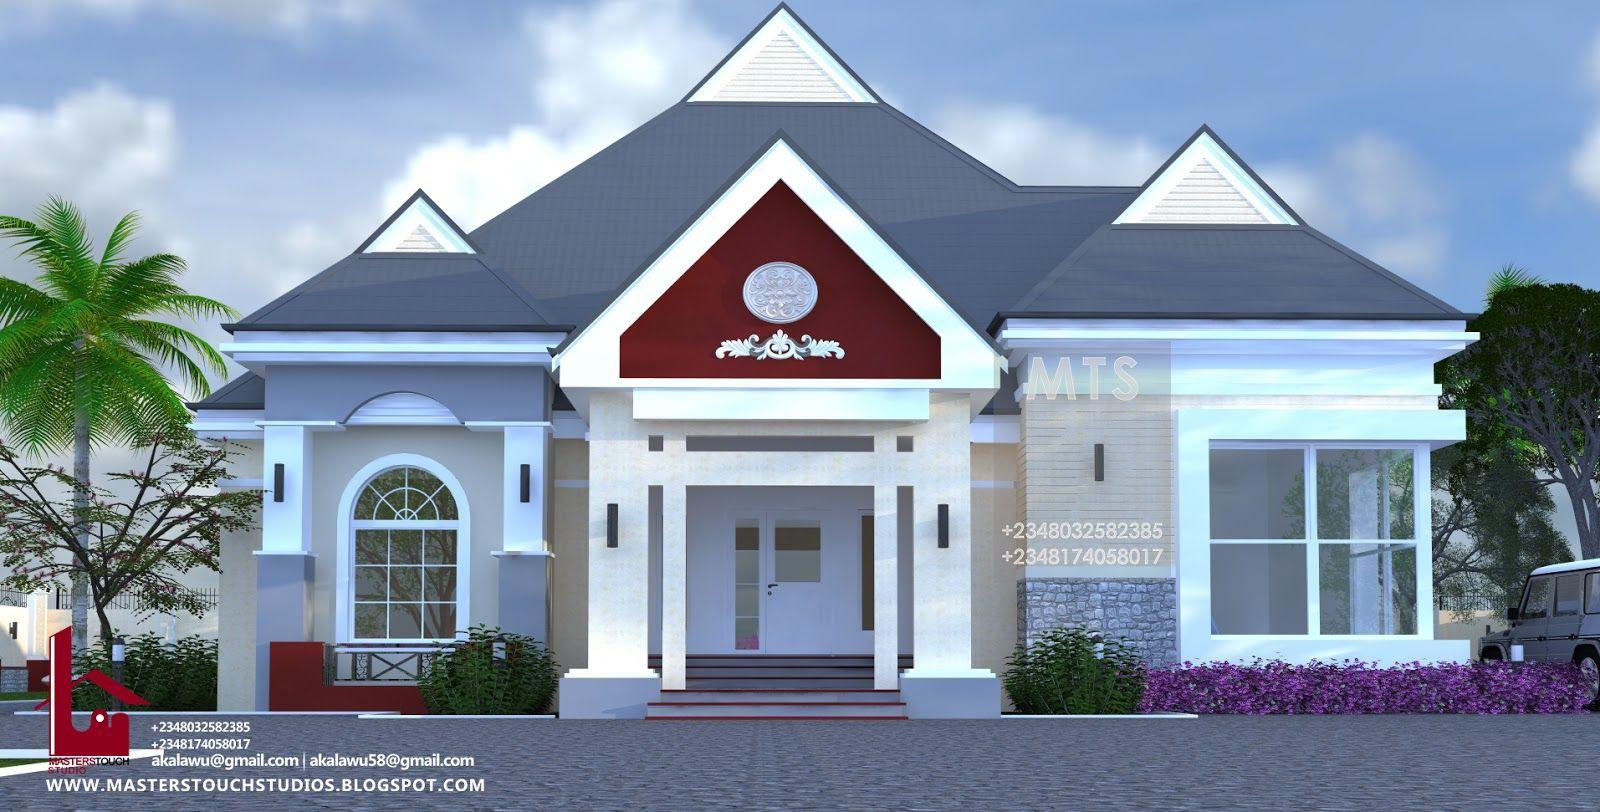 4 Bedroom Bungalow Rf Eb4001 Bungalow House Design 4 Bedroom House Designs House Styles